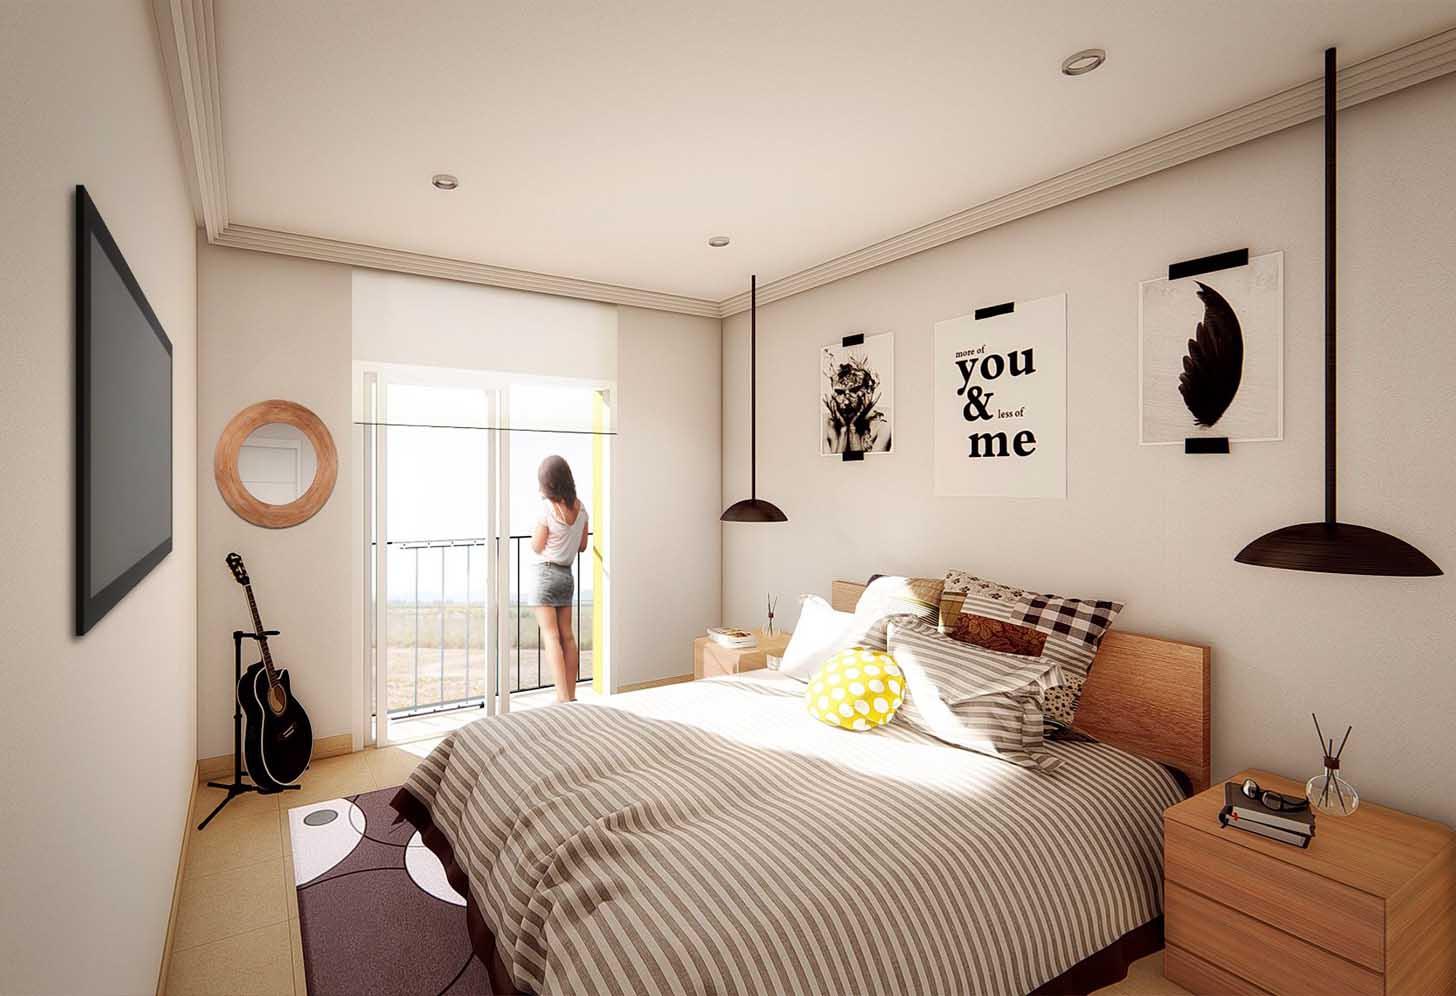 immobilier neuf espagne costa blanca on-d12 santa rosalia village chambre